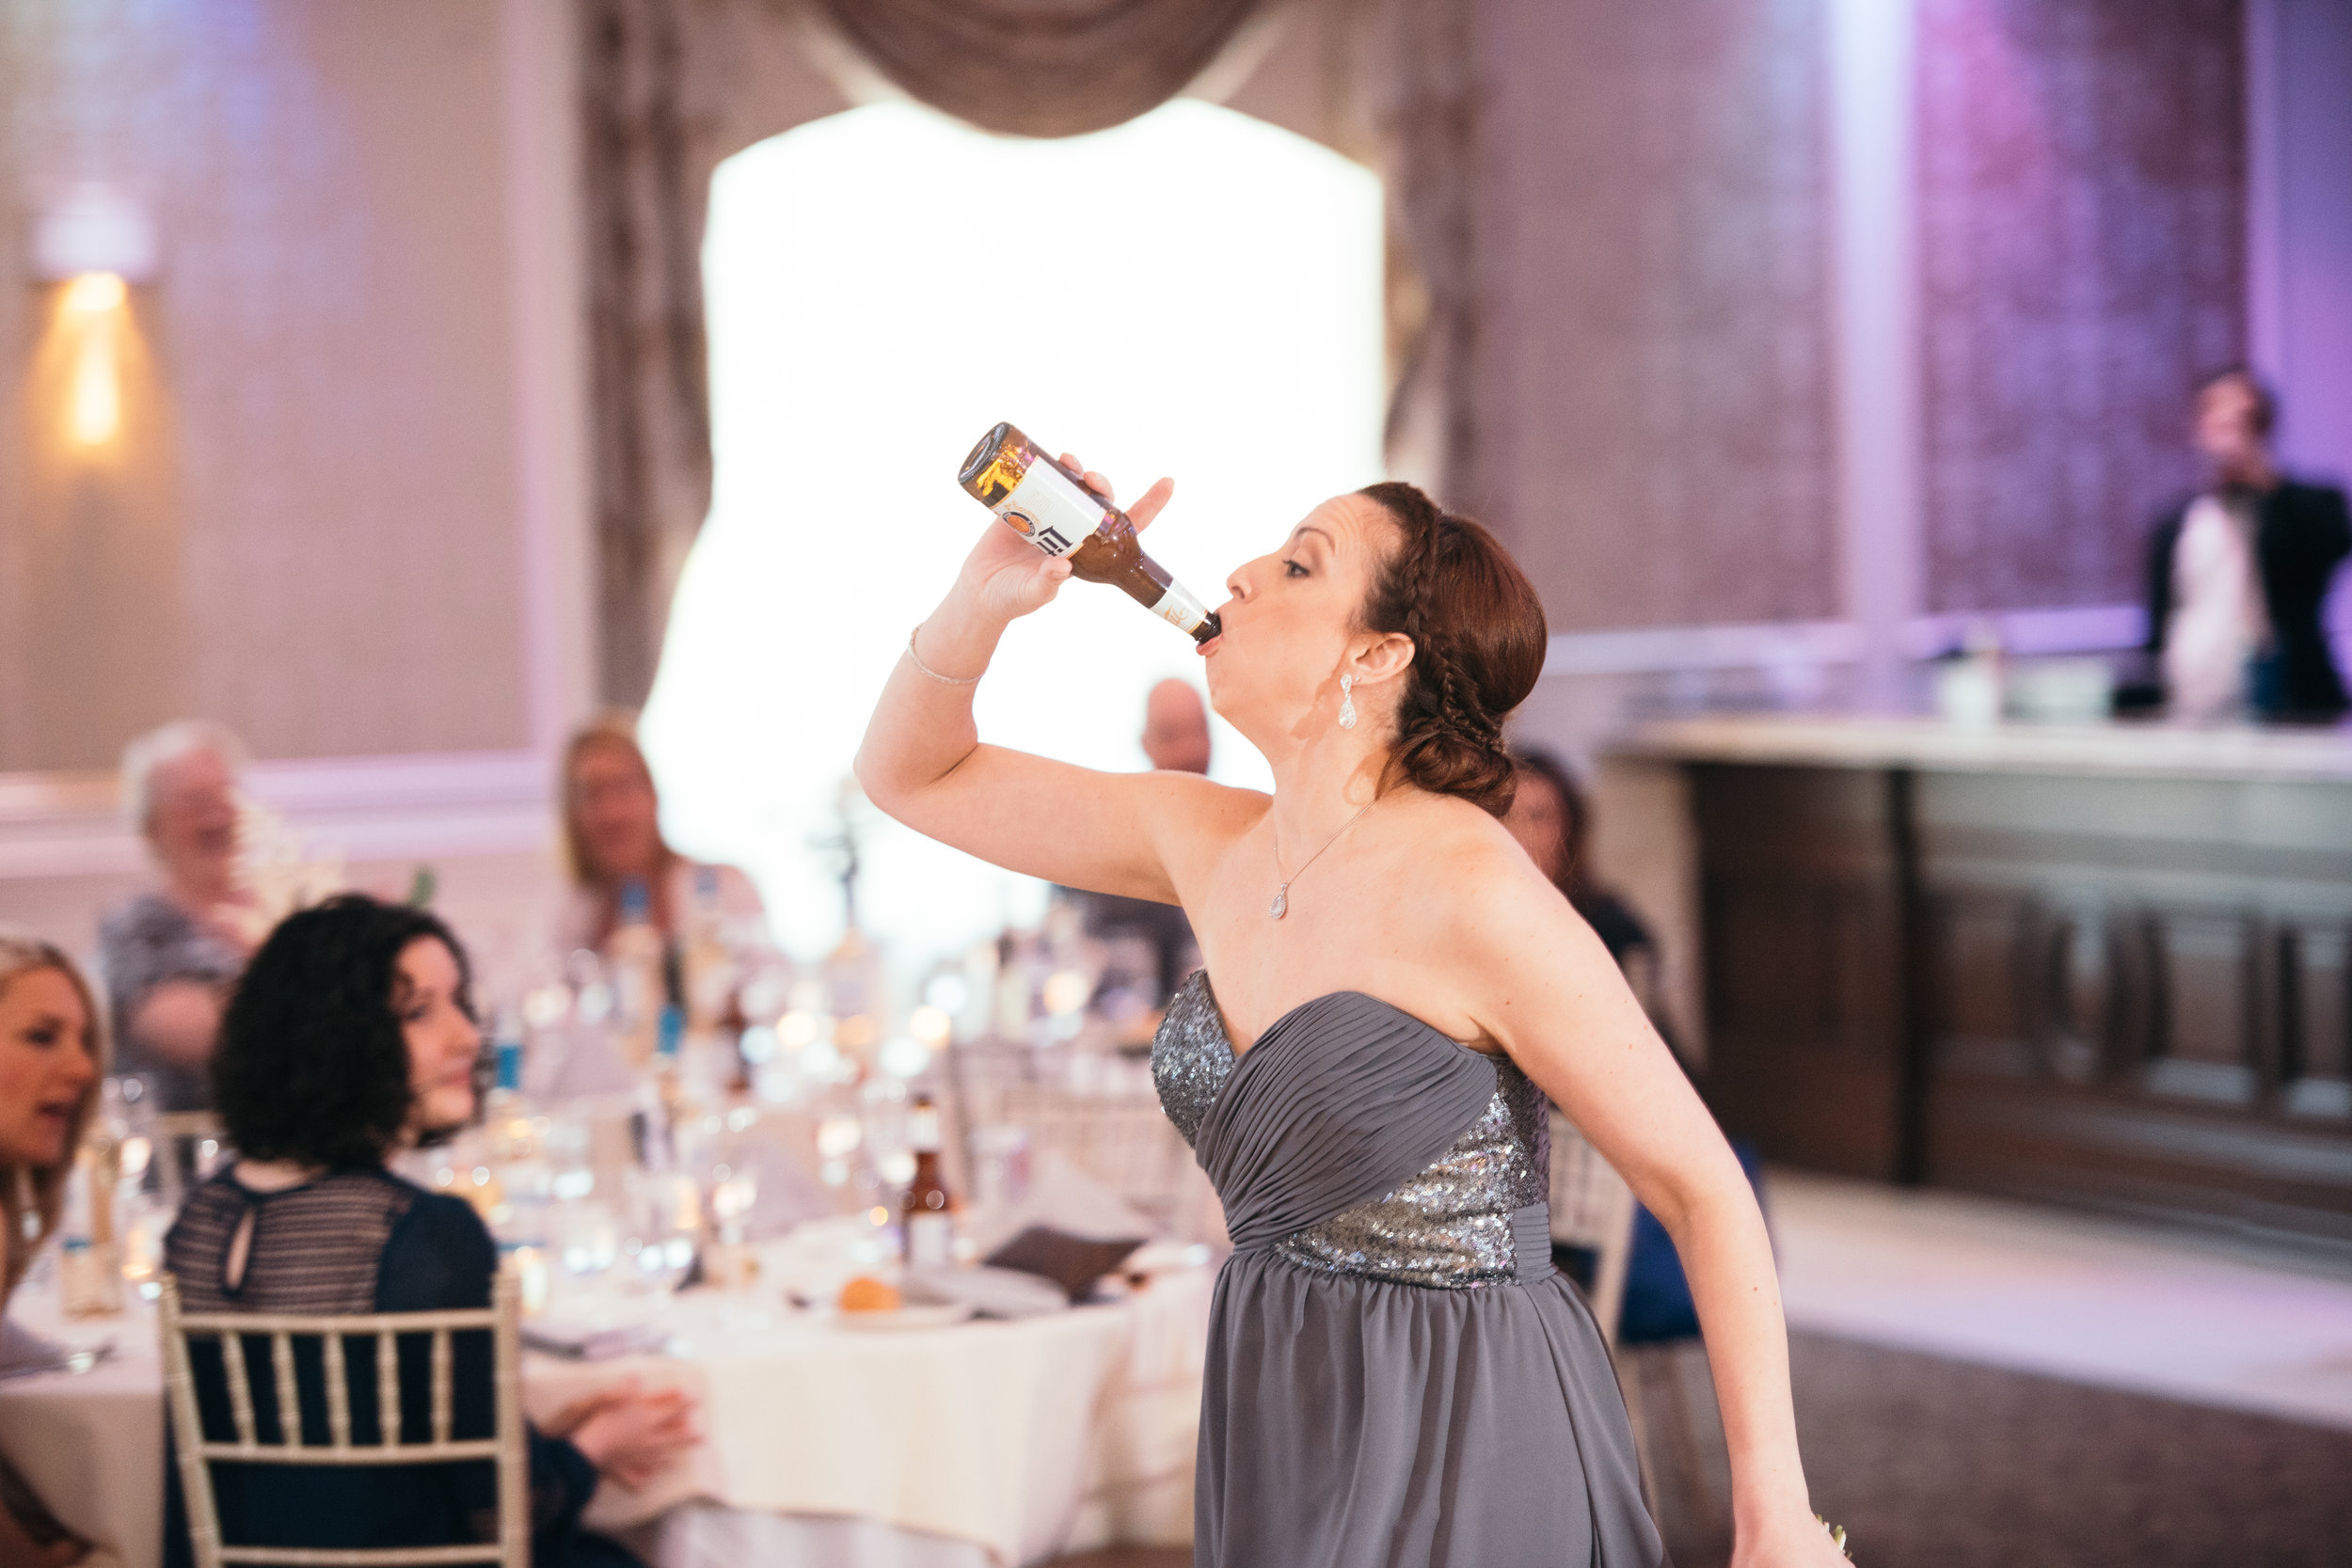 WeddingPhotos | NJPhotographer | Highlights-1-45.jpg